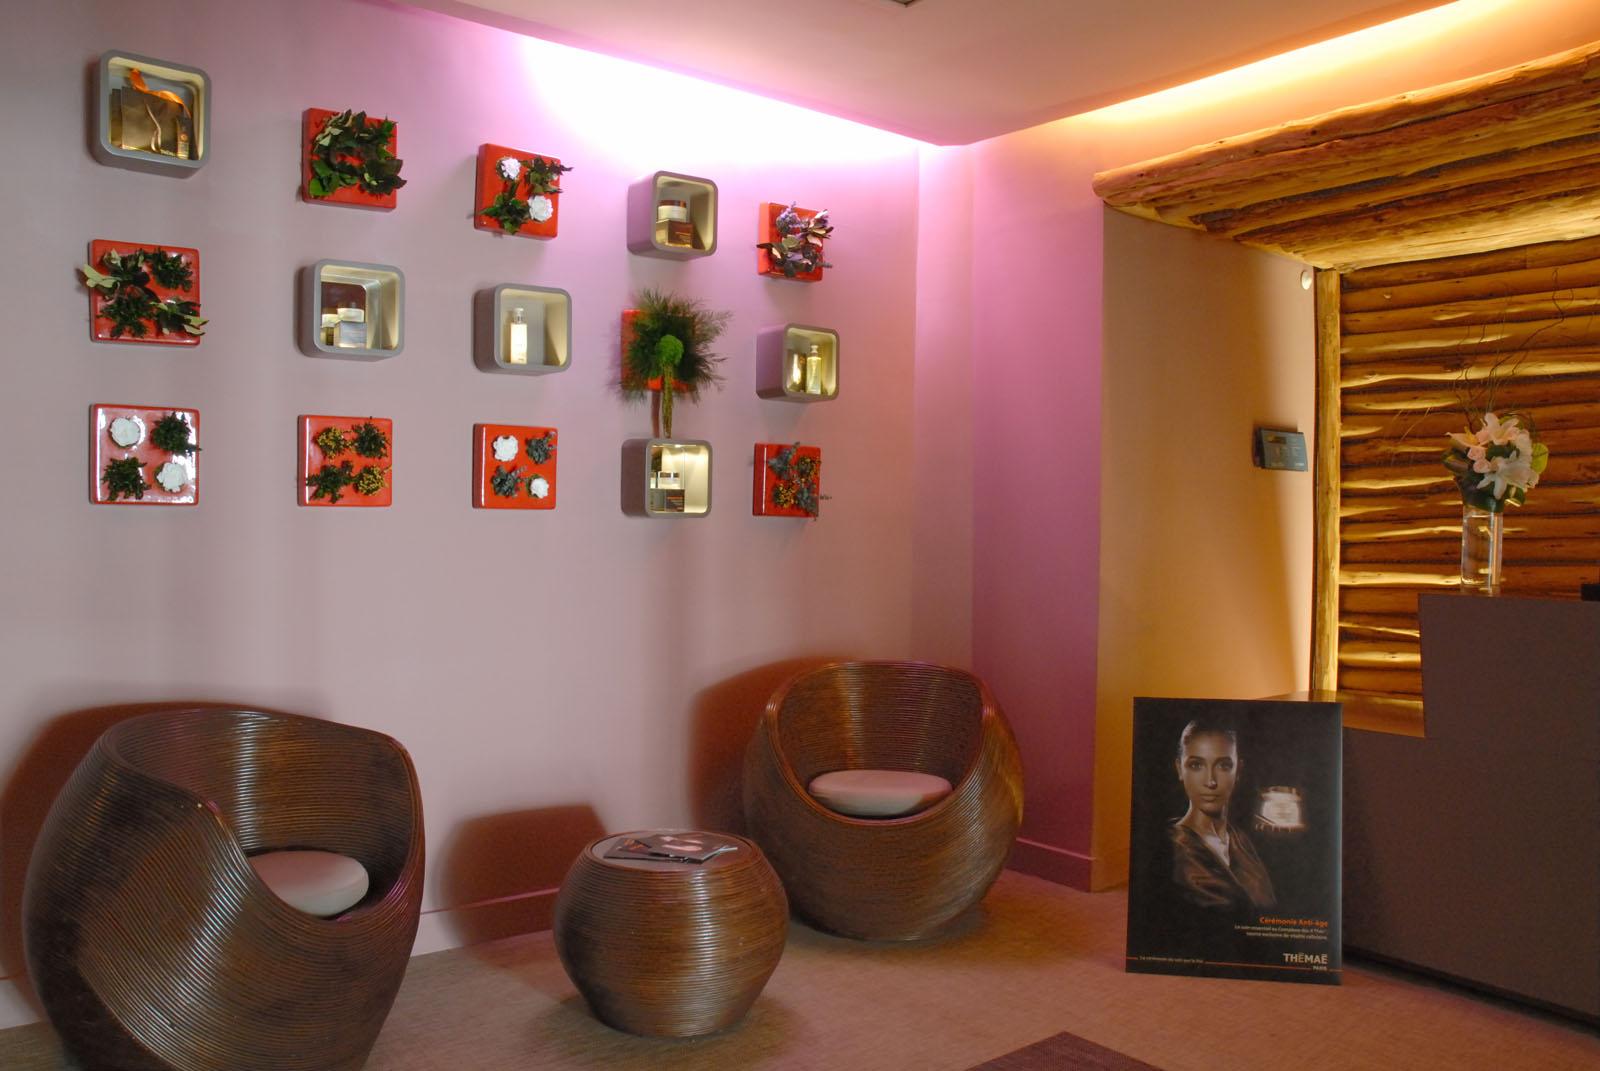 Spa reception at Kenzi Tower Hotel in central Casablanca, Morocc